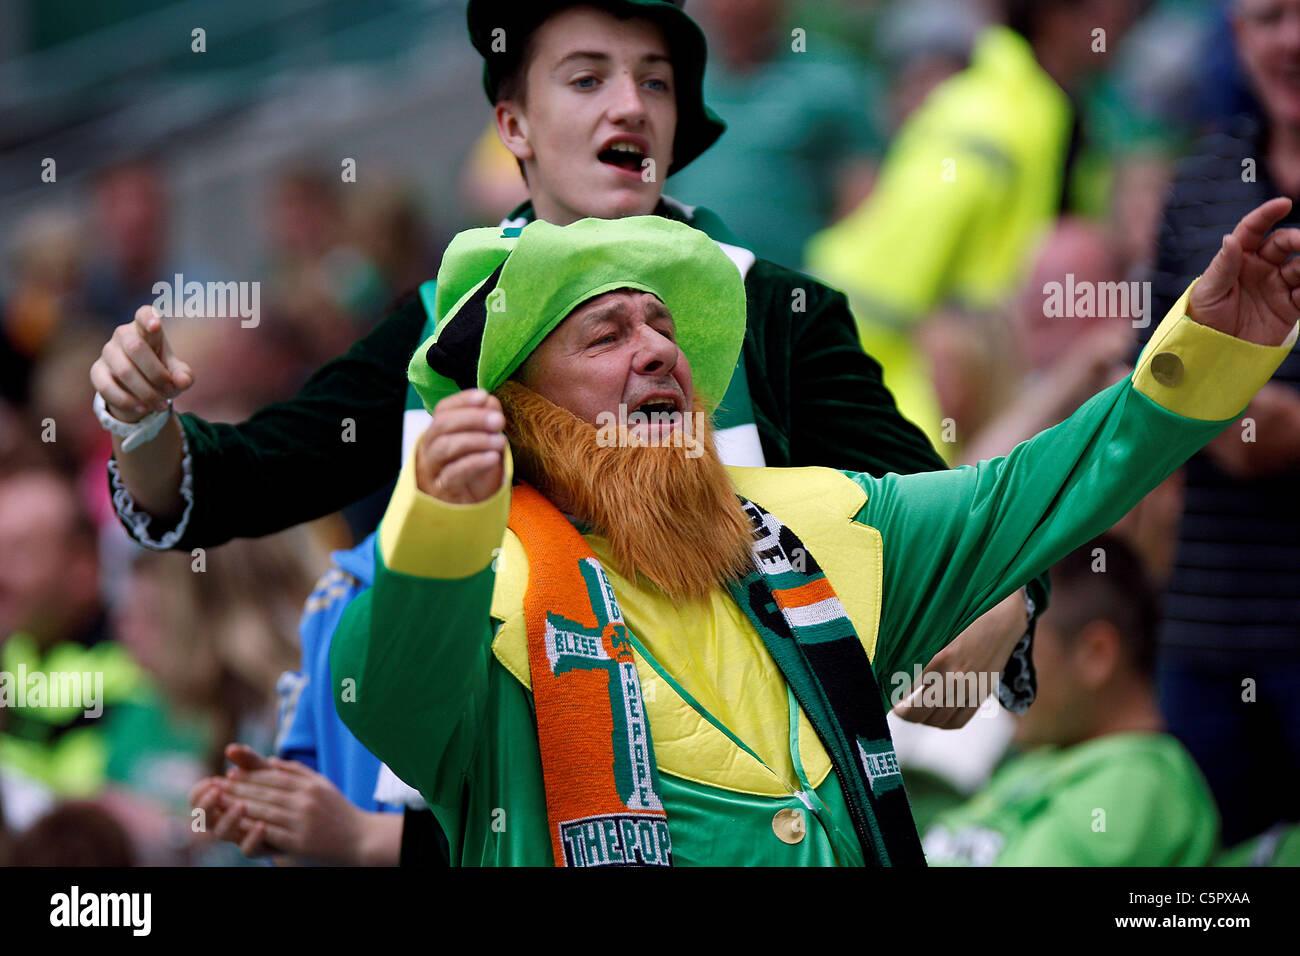 31.07.2011 - Fans enjoying the match, Dublin Super Cup 2011 in the Aviva Stadium Dublin (Celtic vs Airtricity XI) - Stock Image